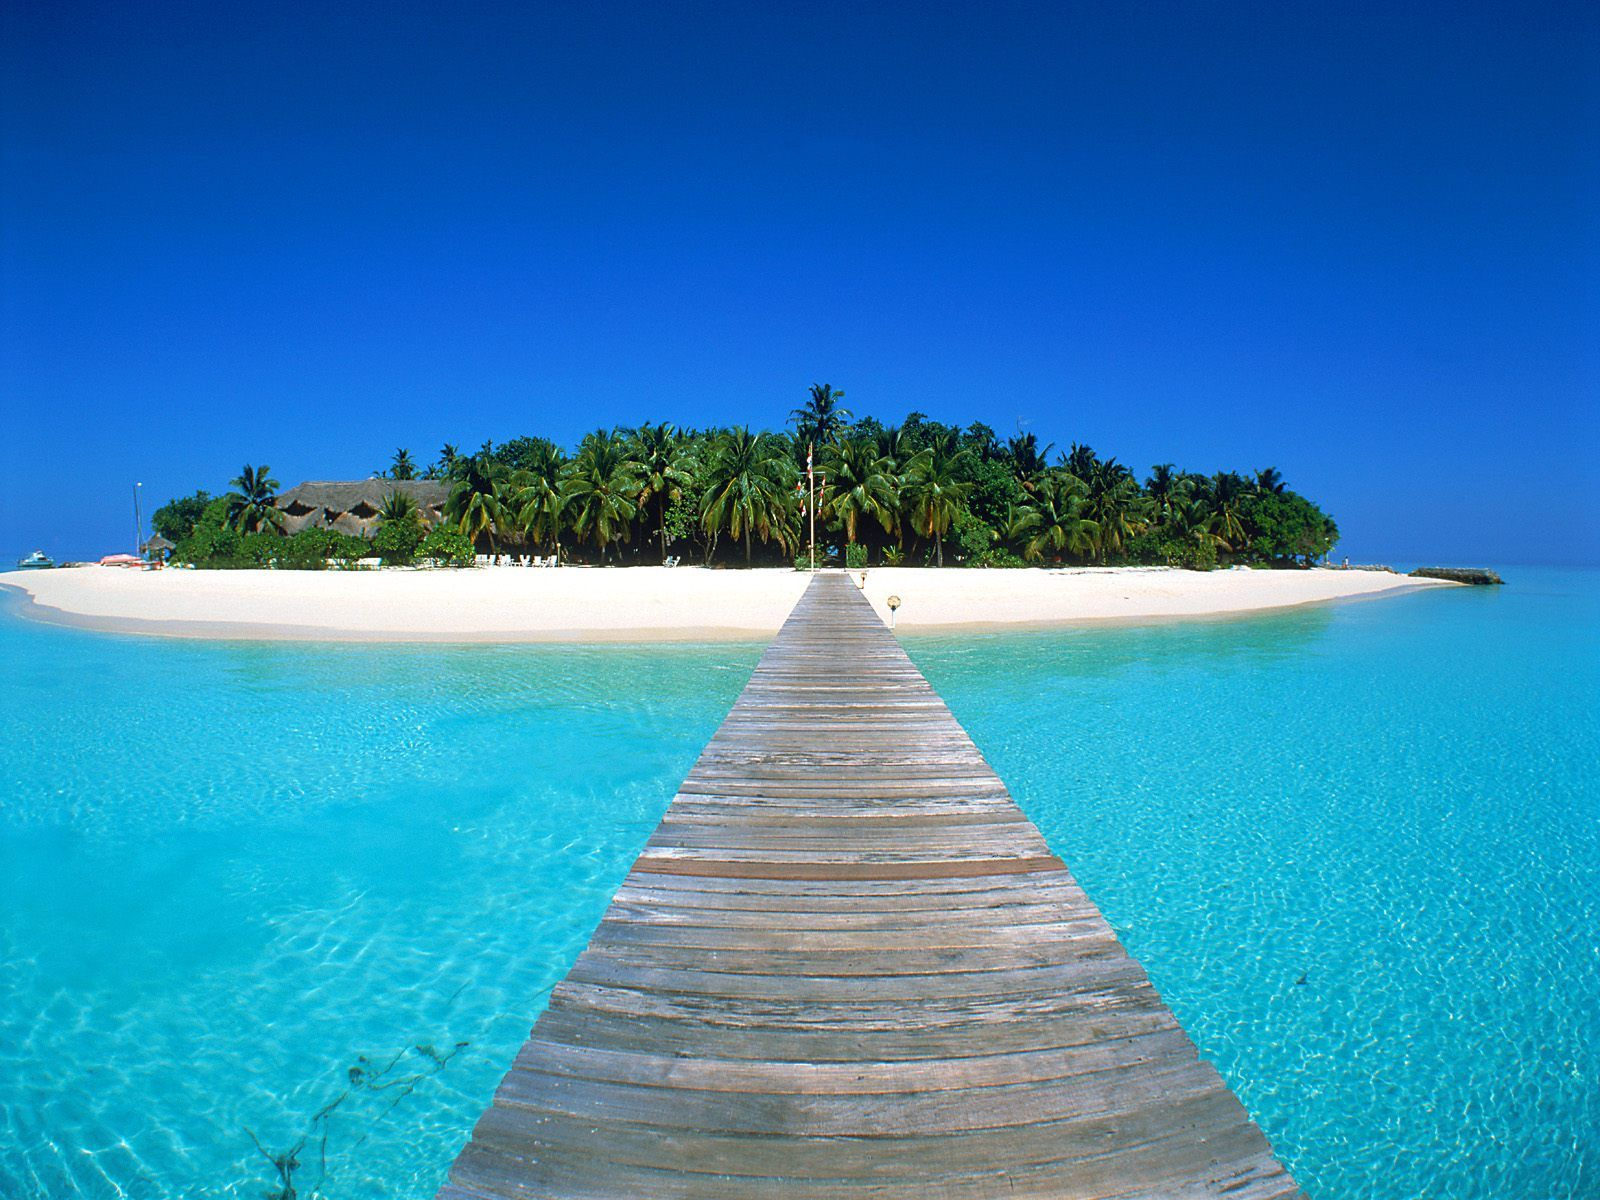 Maldives Resorts How To Choose The Best One Maldives Vacation - Island resort maldives definition paradise